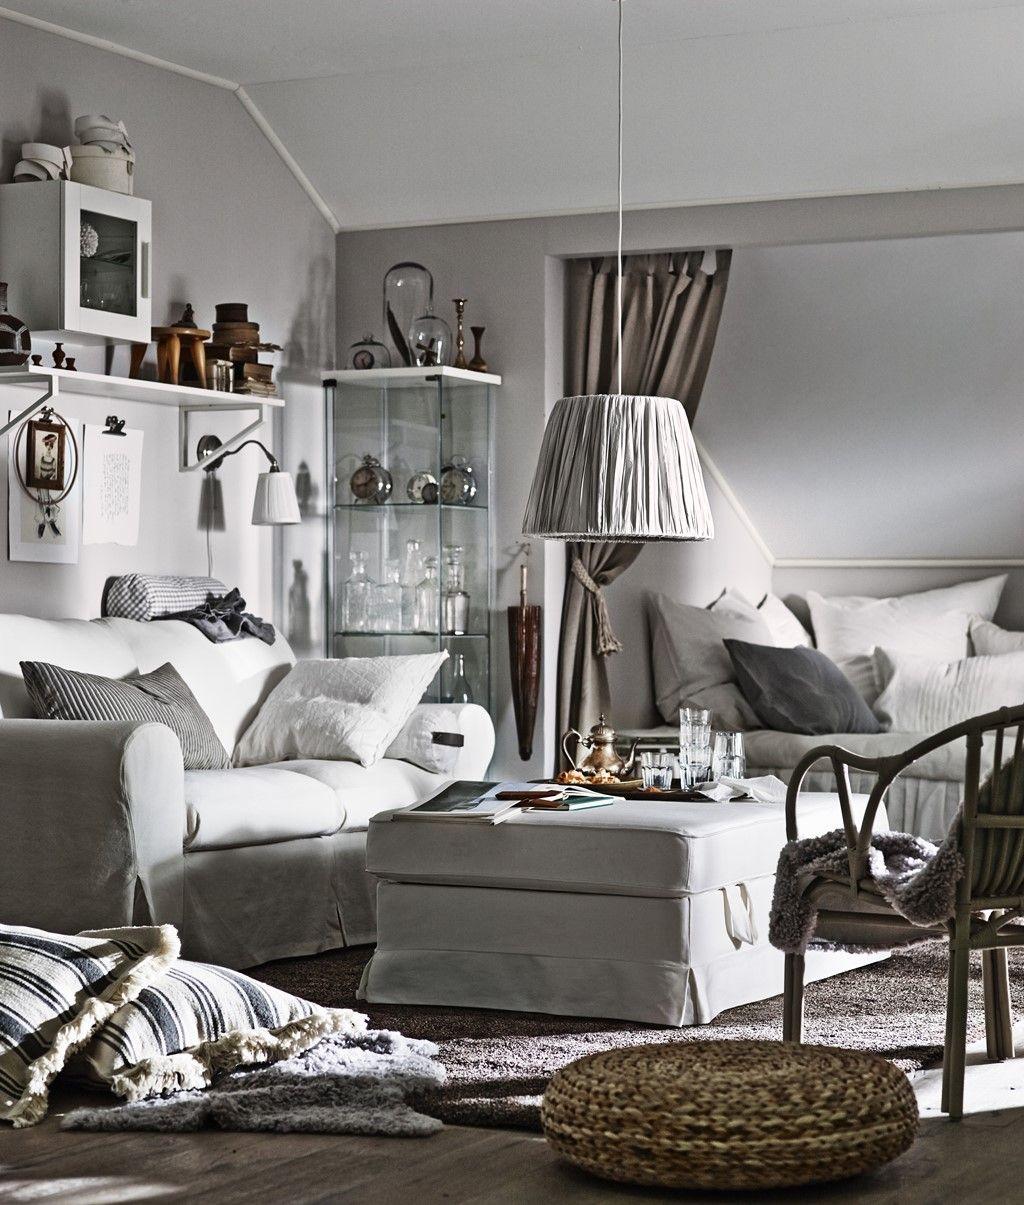 18_salones_IKEA   Decomadera   Pinterest   Salón ikea, Ikea y Catálogo